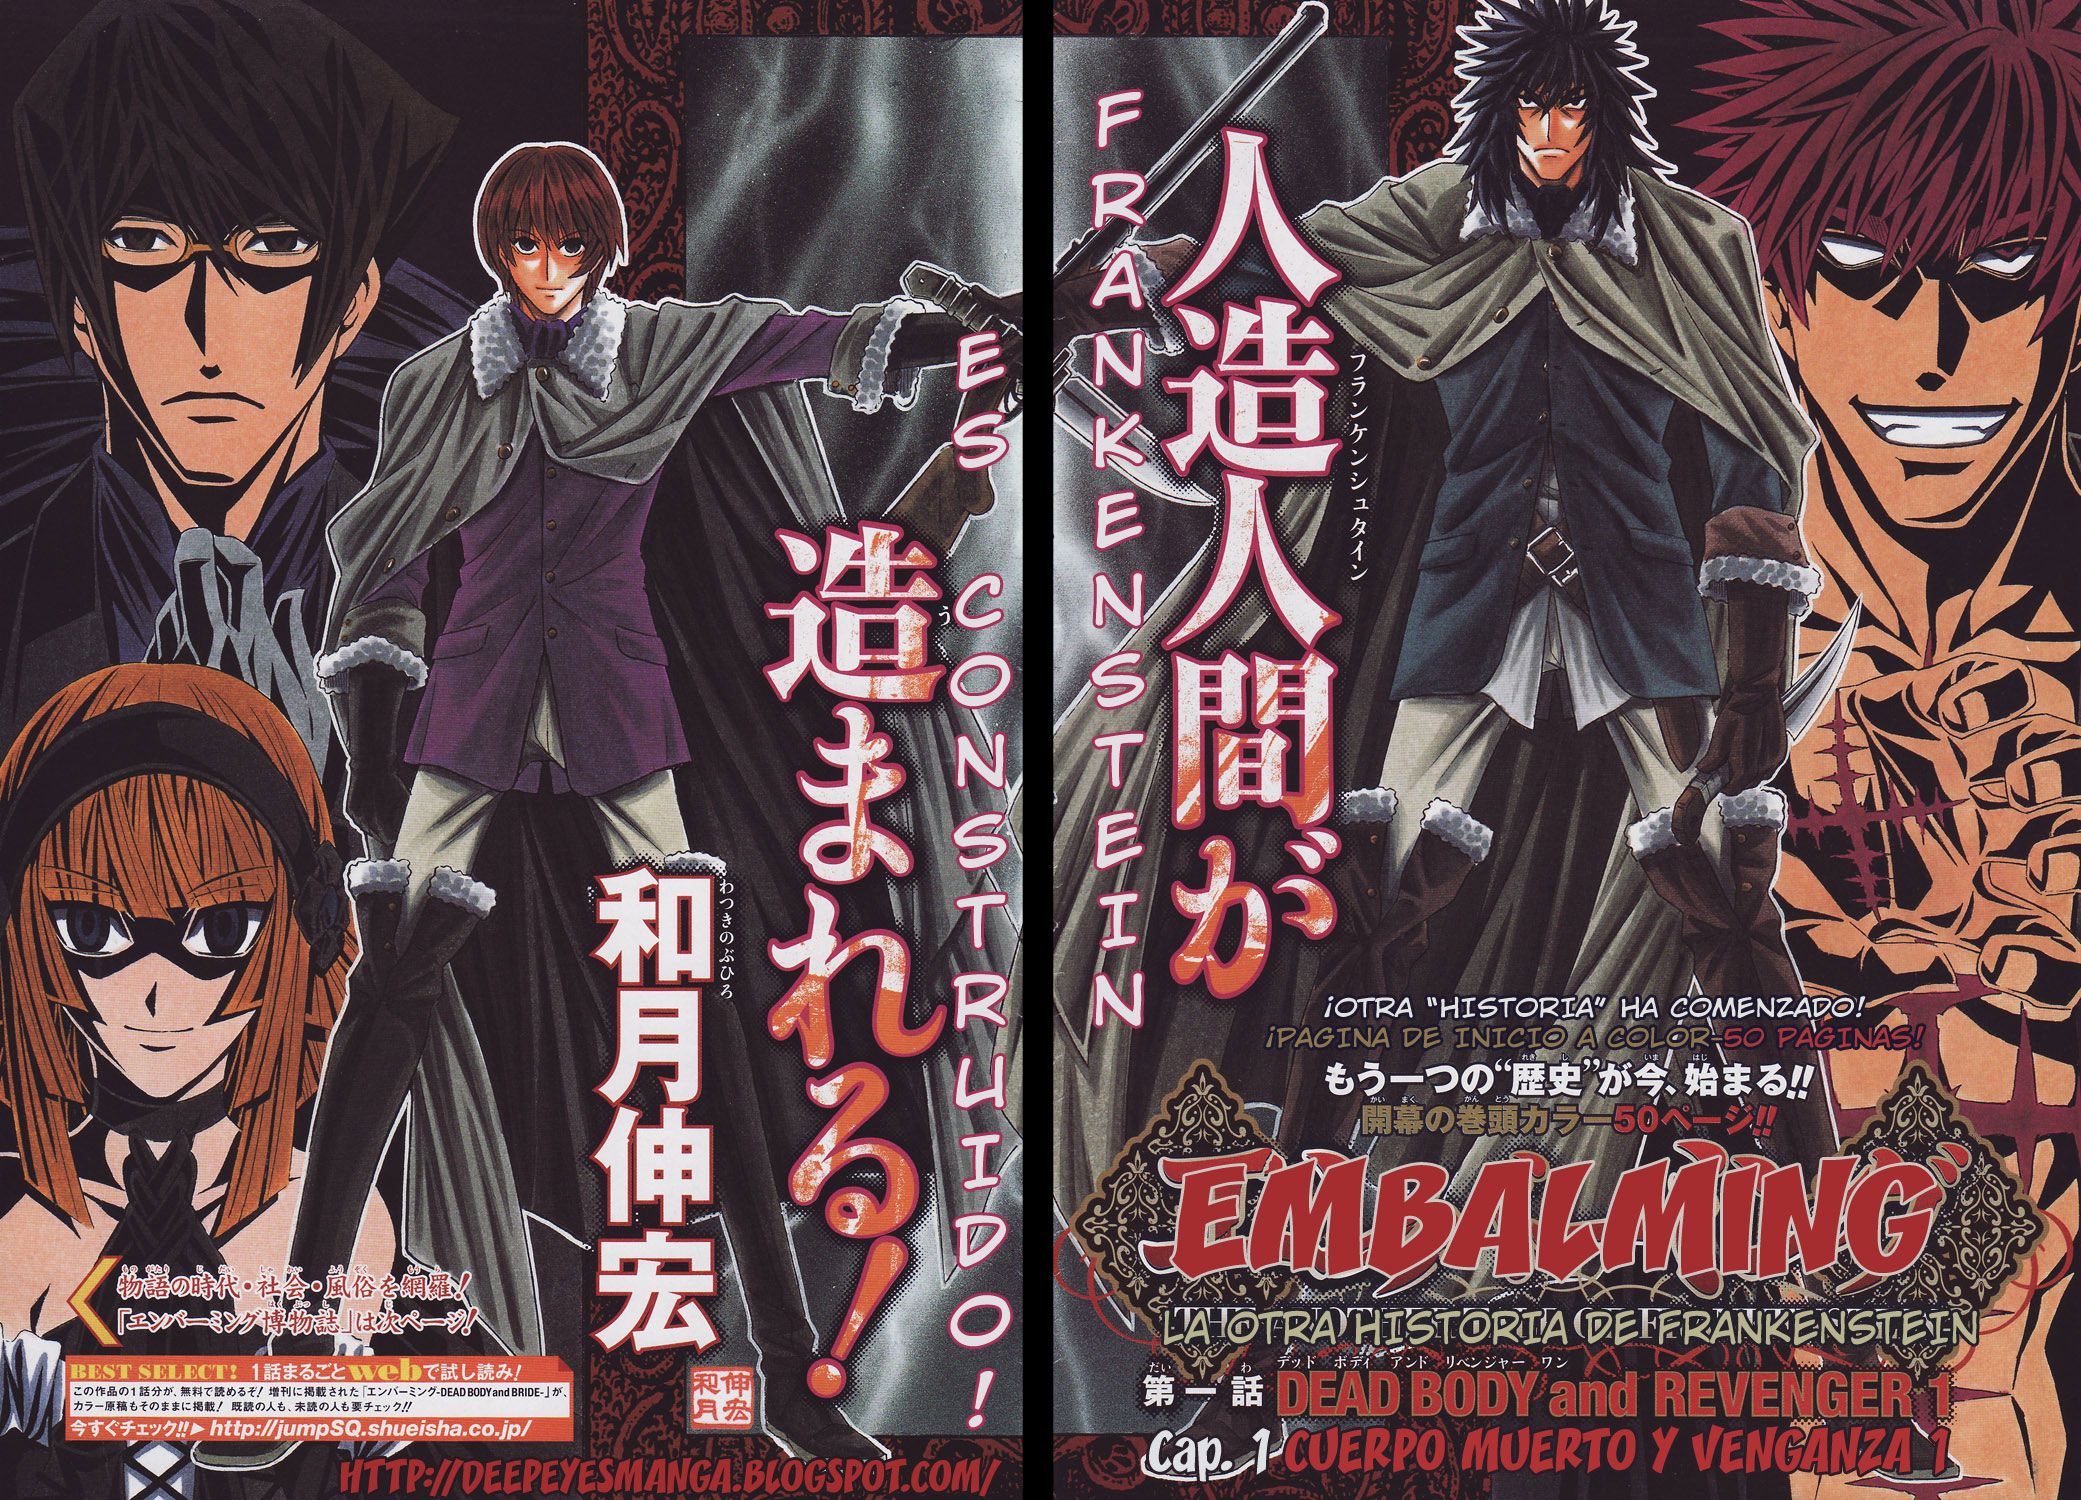 http://c5.ninemanga.com/es_manga/45/18797/447892/40391729f1075cb75501507cea984c47.jpg Page 2